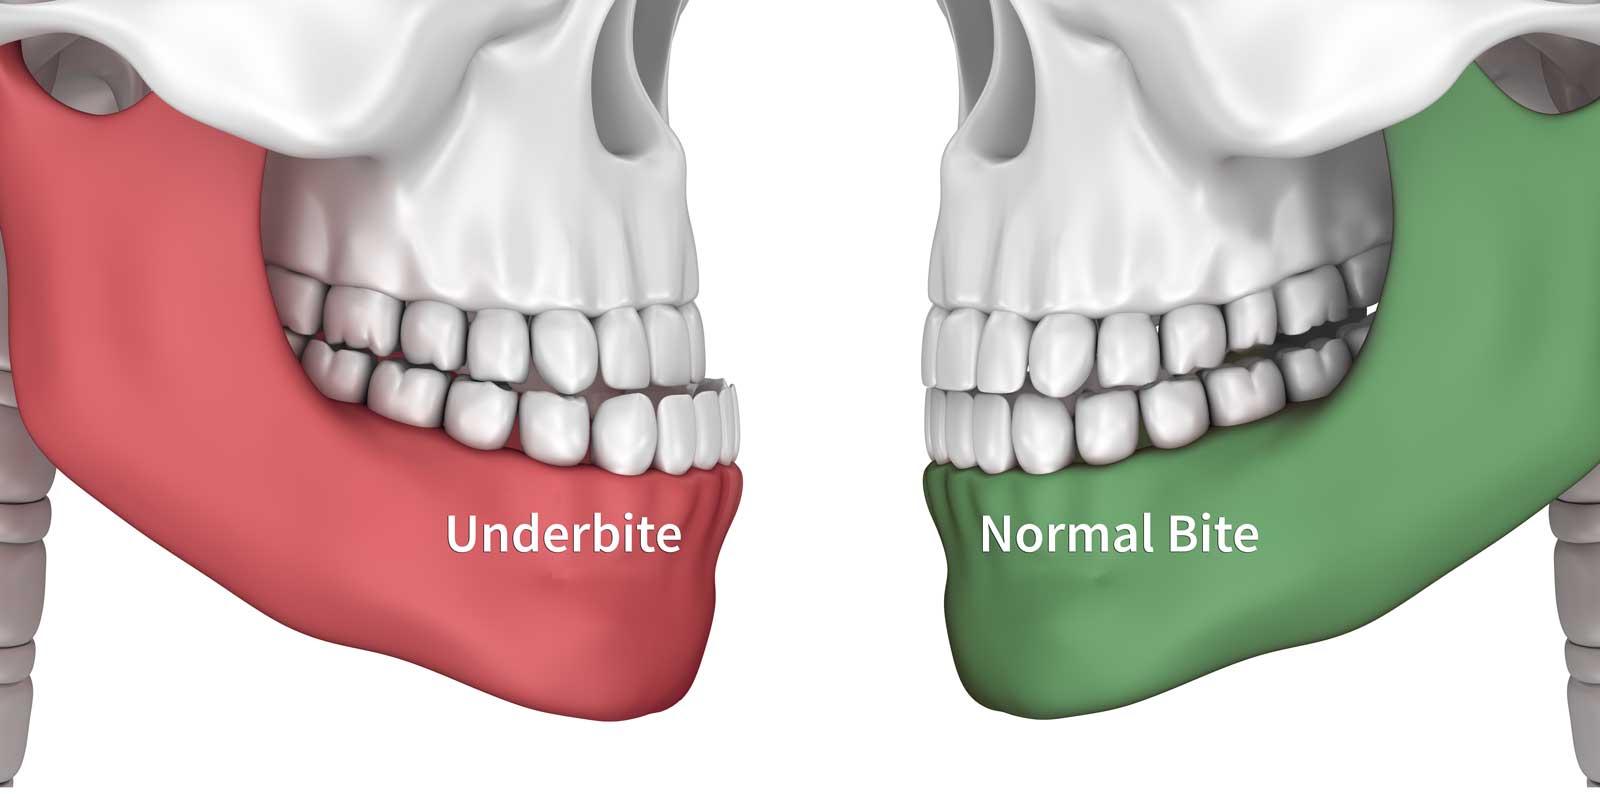 Comparison of normal bite and underbite